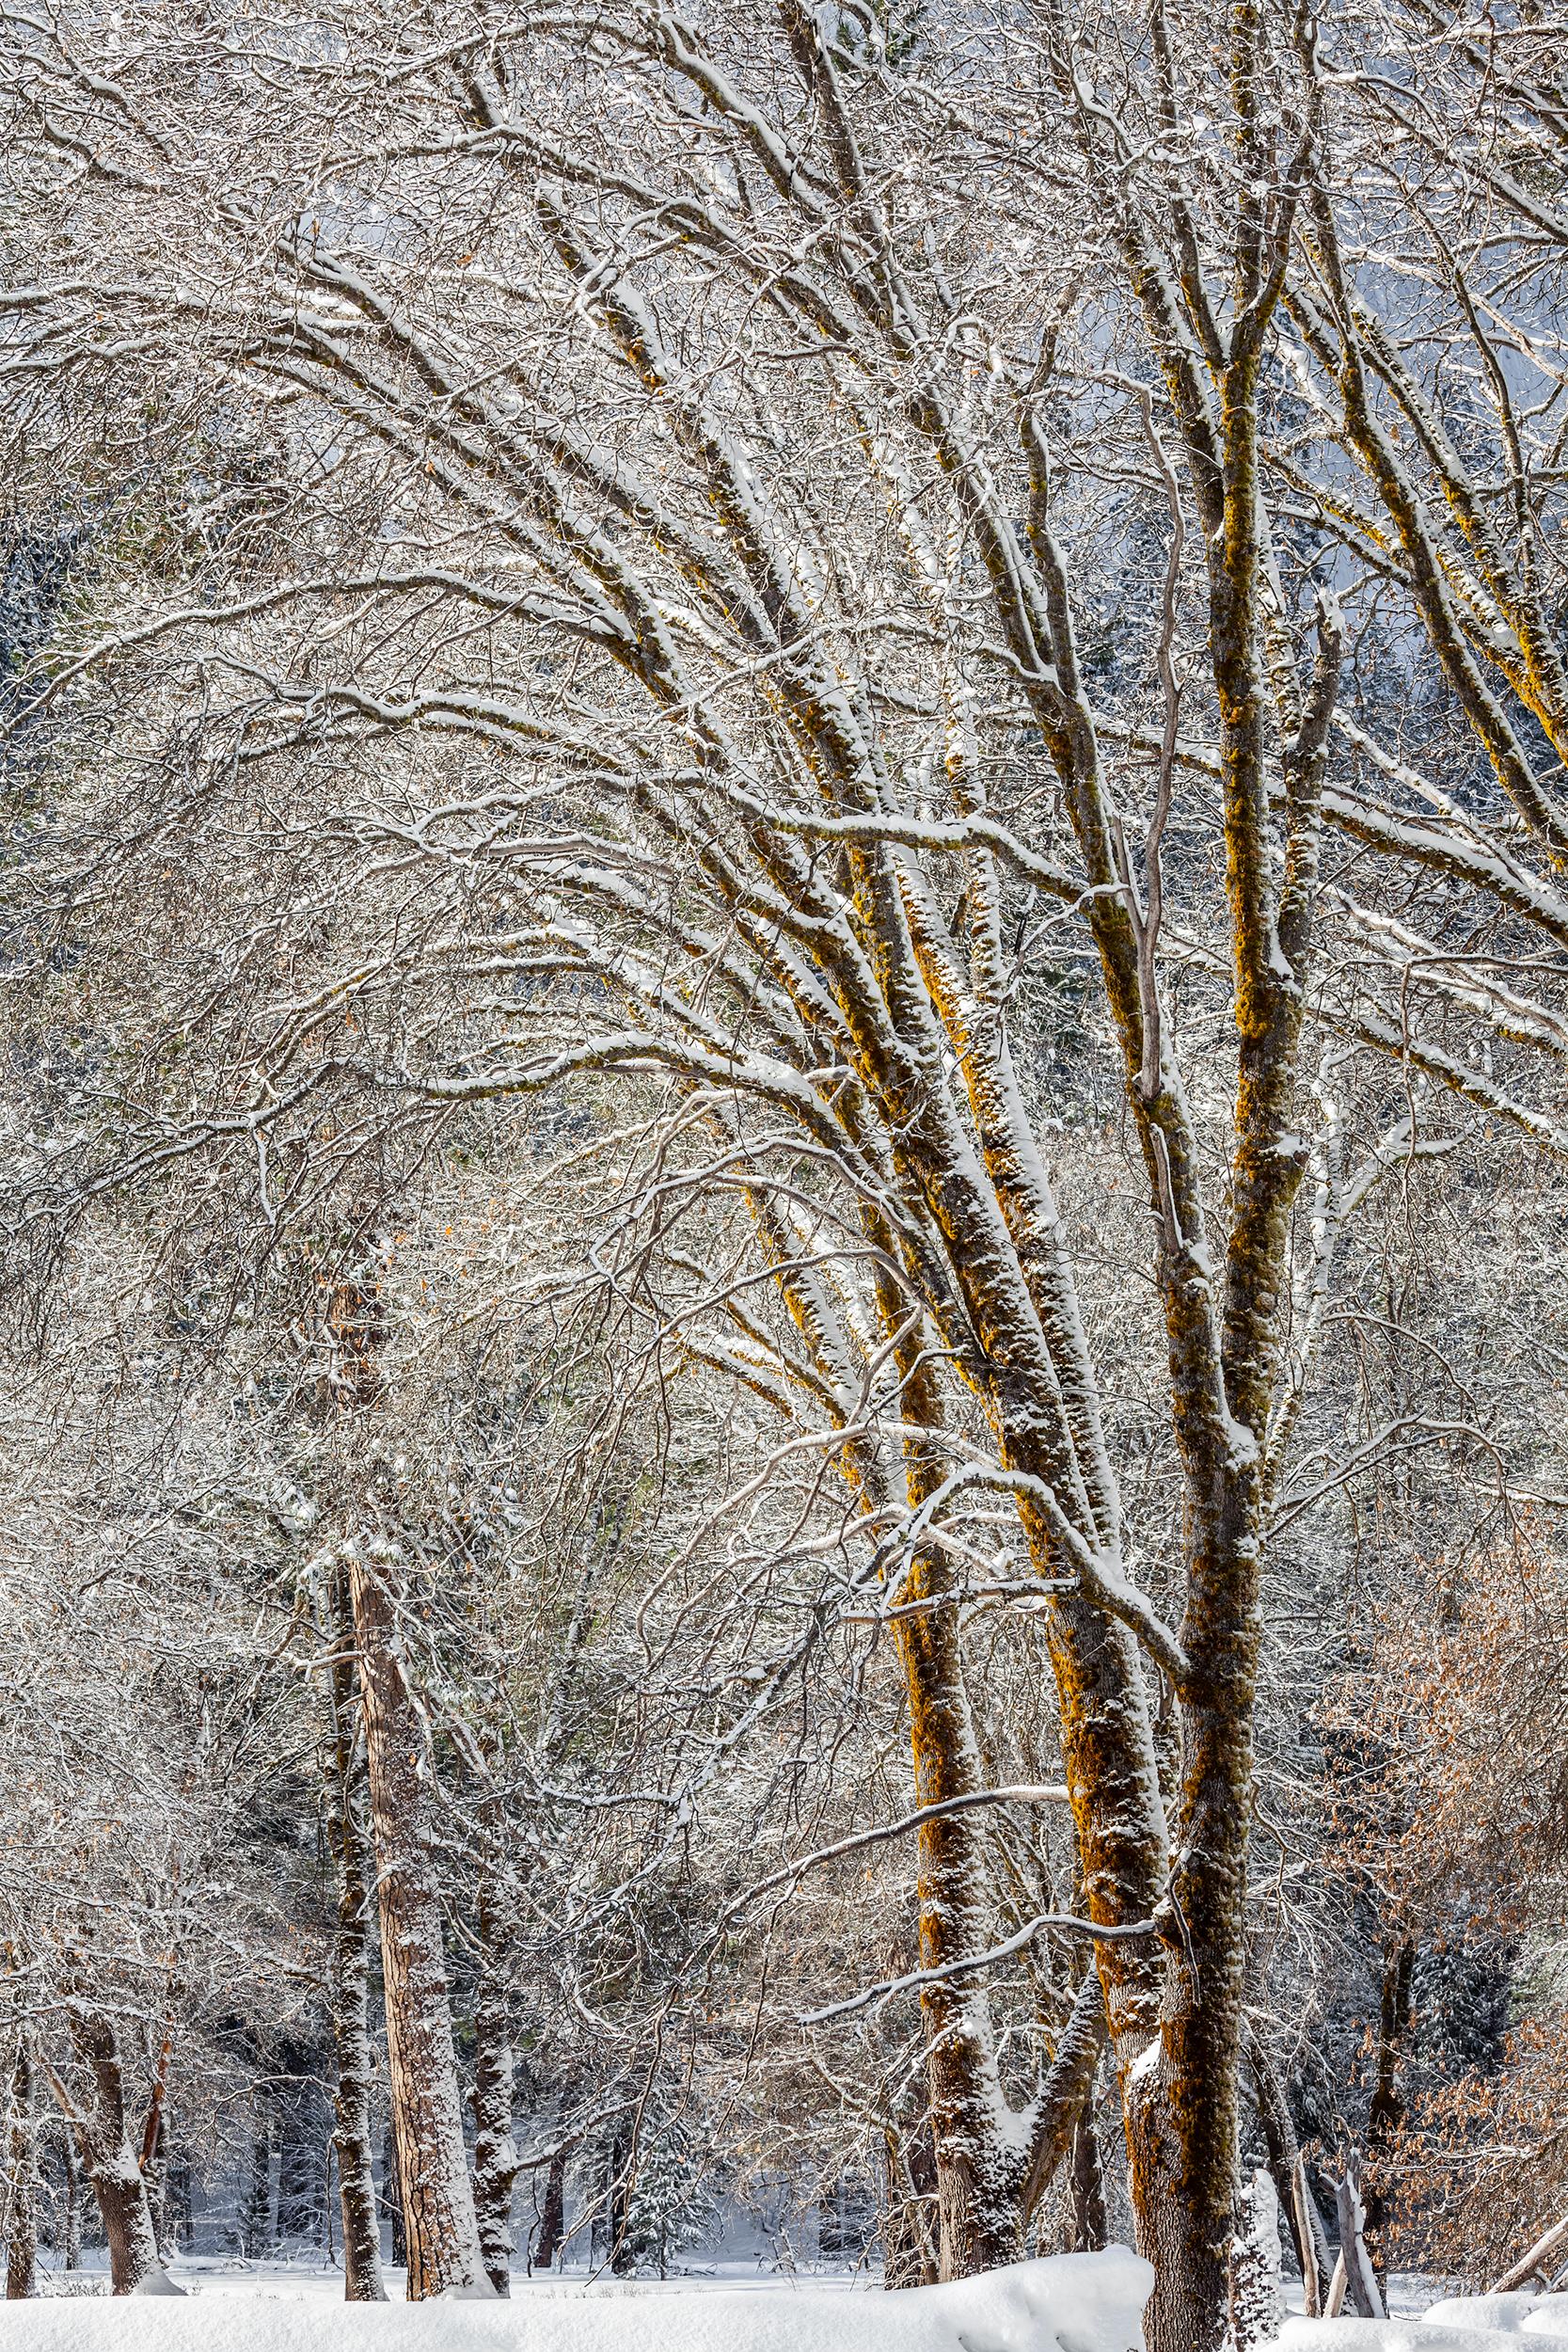 Black Oaks & Snow (9501)